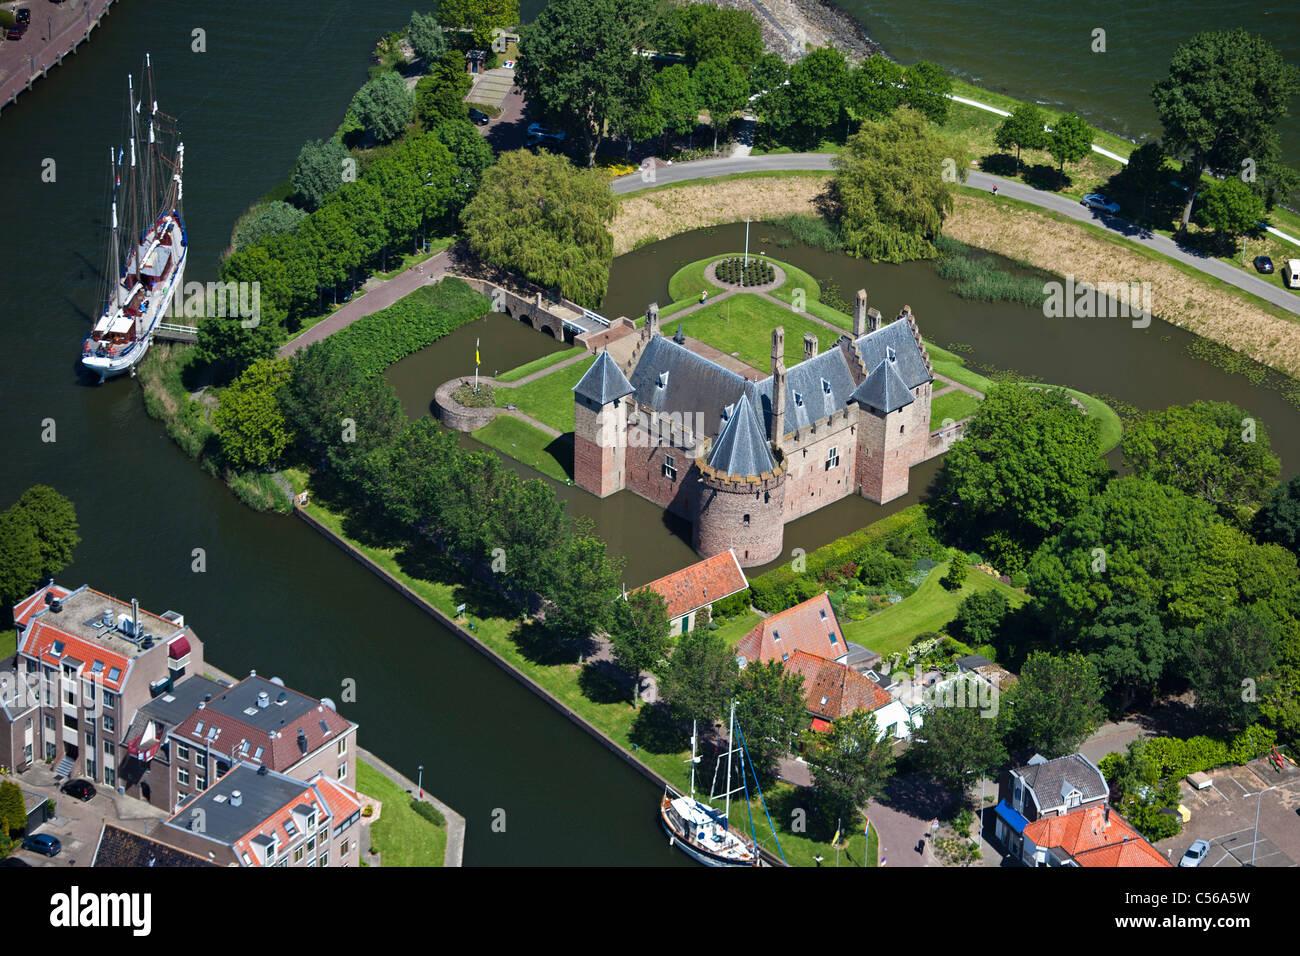 The Netherlands, Medemblik, Castle called Radboud. Aerial. - Stock Image